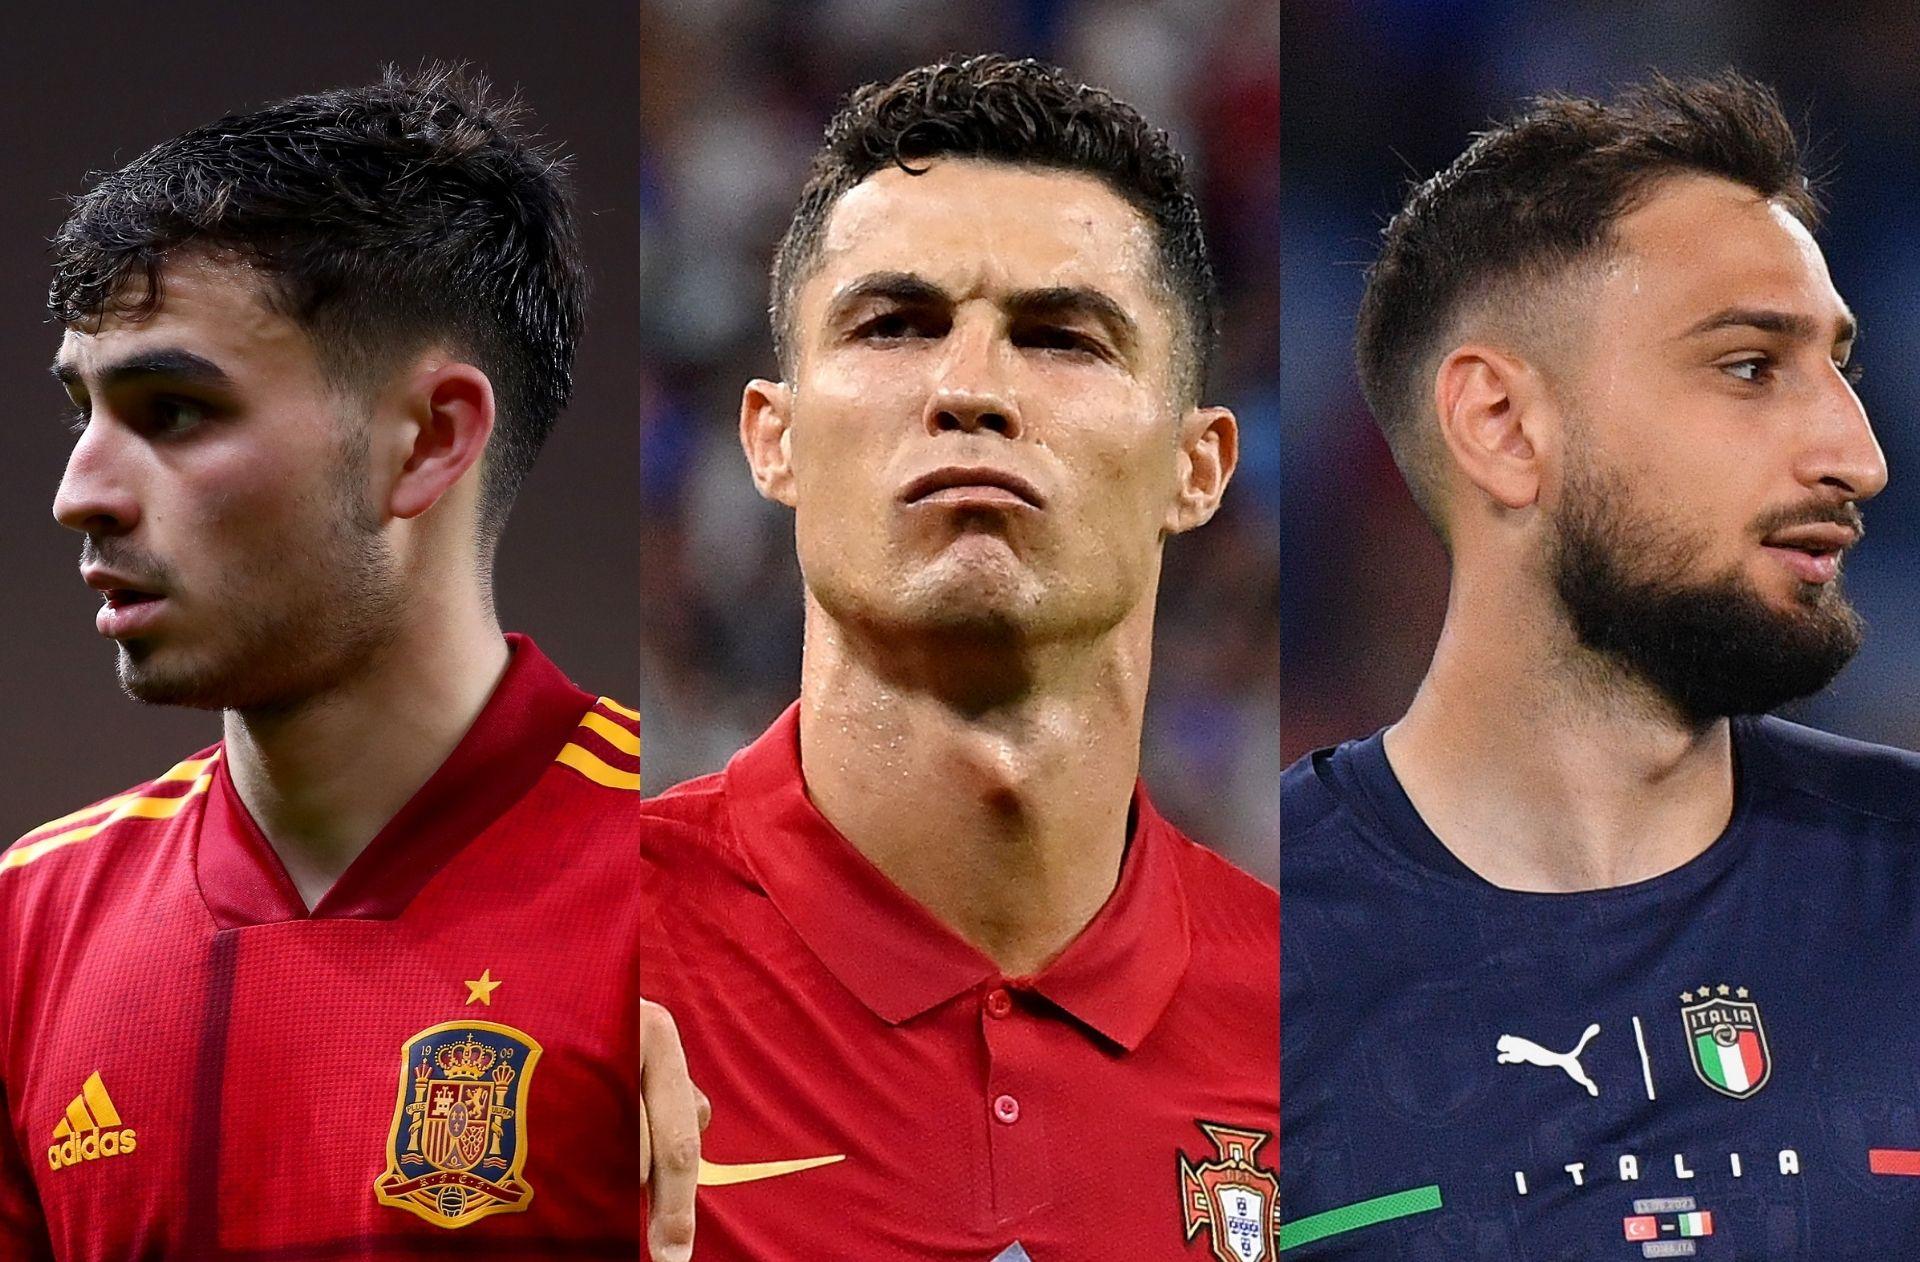 Euro 2020 Player of the Tournament & Golden Boot winner